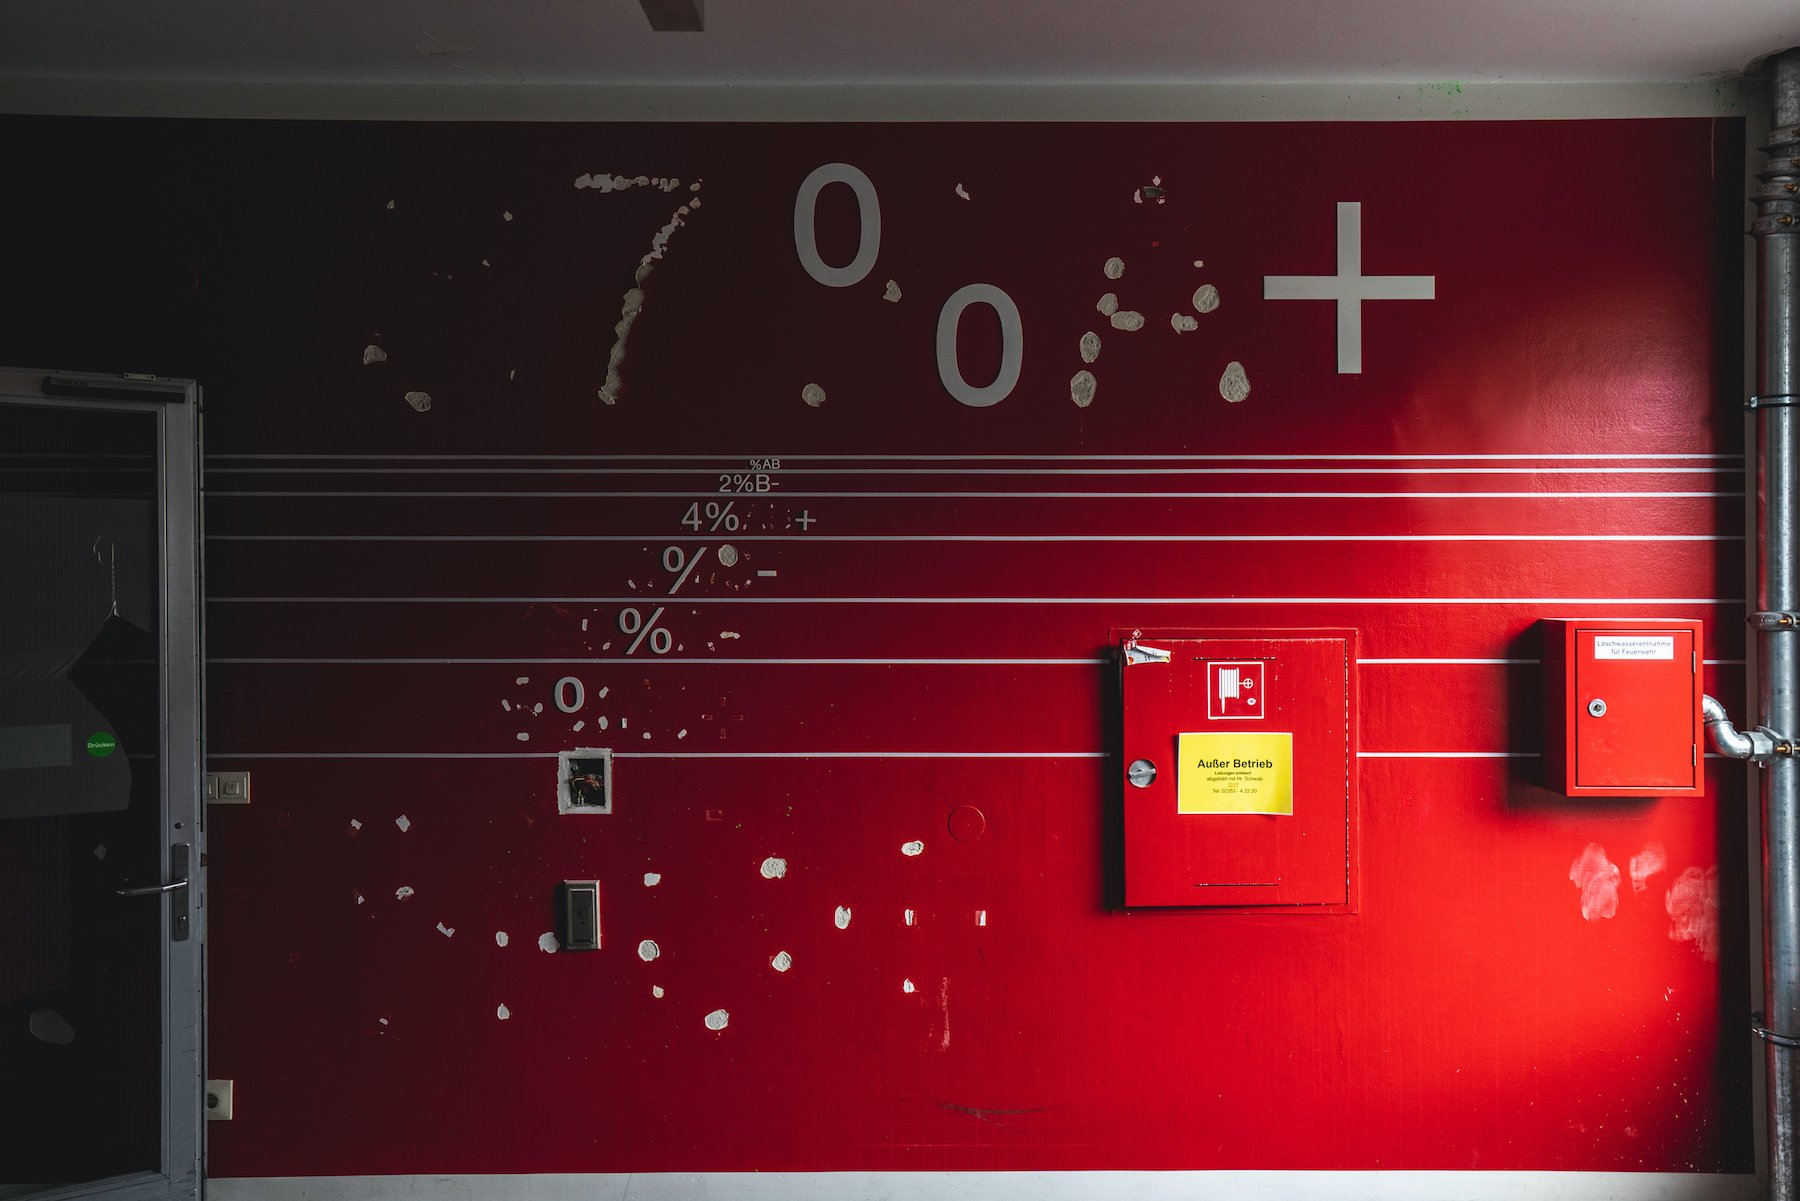 Kunstlabor2, Kunstlabor 2, Geheimtipp Muenchen, Geheimtipp München, Kreativer Hotspot, Kunst, Kultur, Street Art – ©wunderland media GmbH